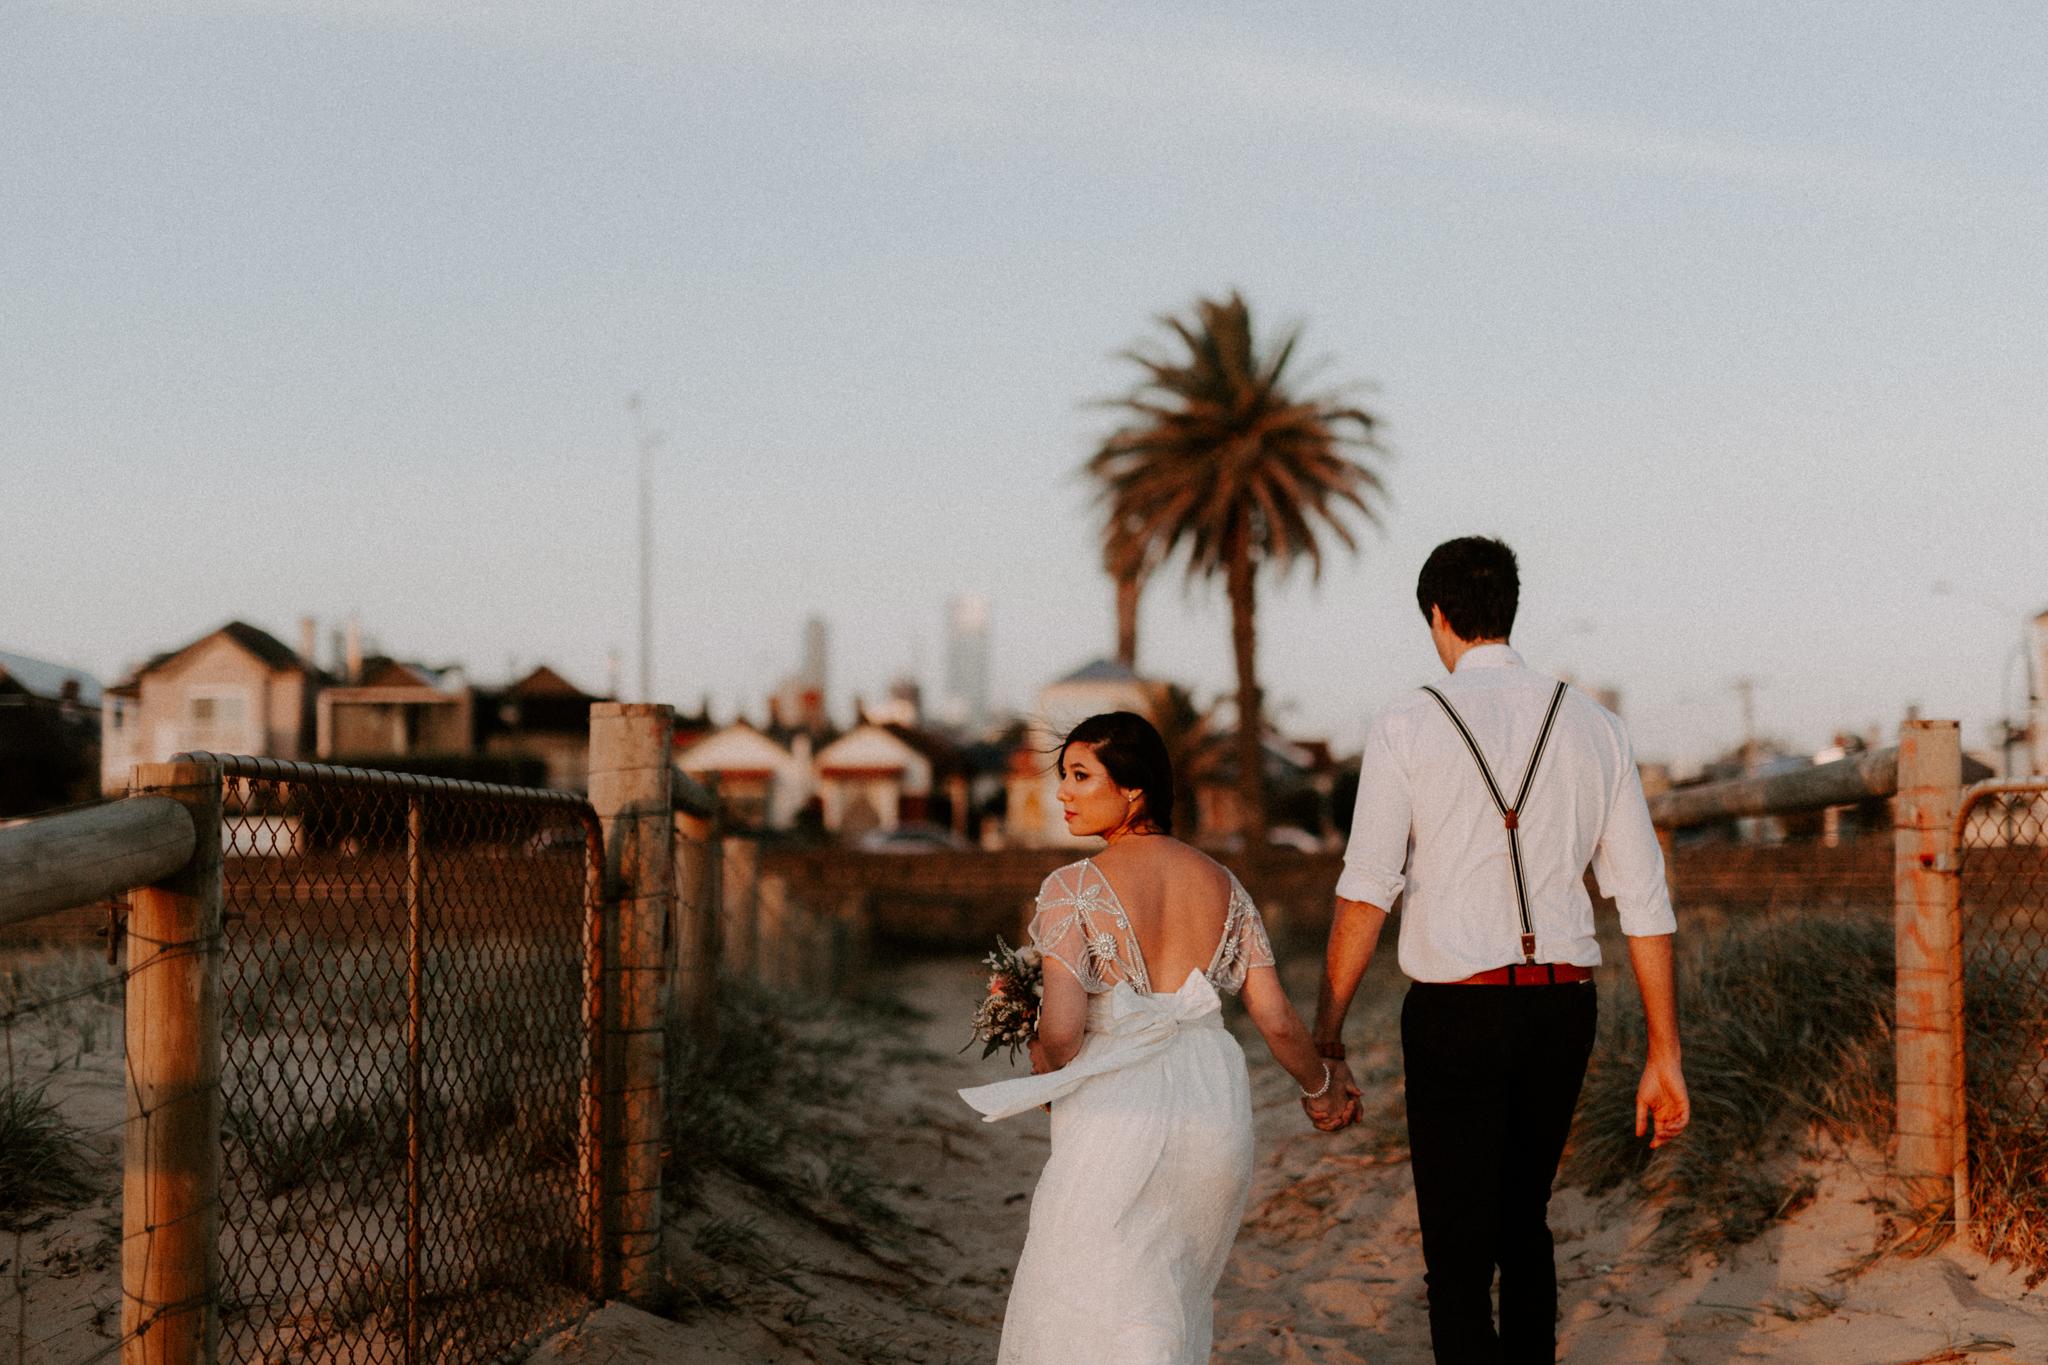 St-Ali-Wedding-Emotions-and-Math-Photography-103.jpg